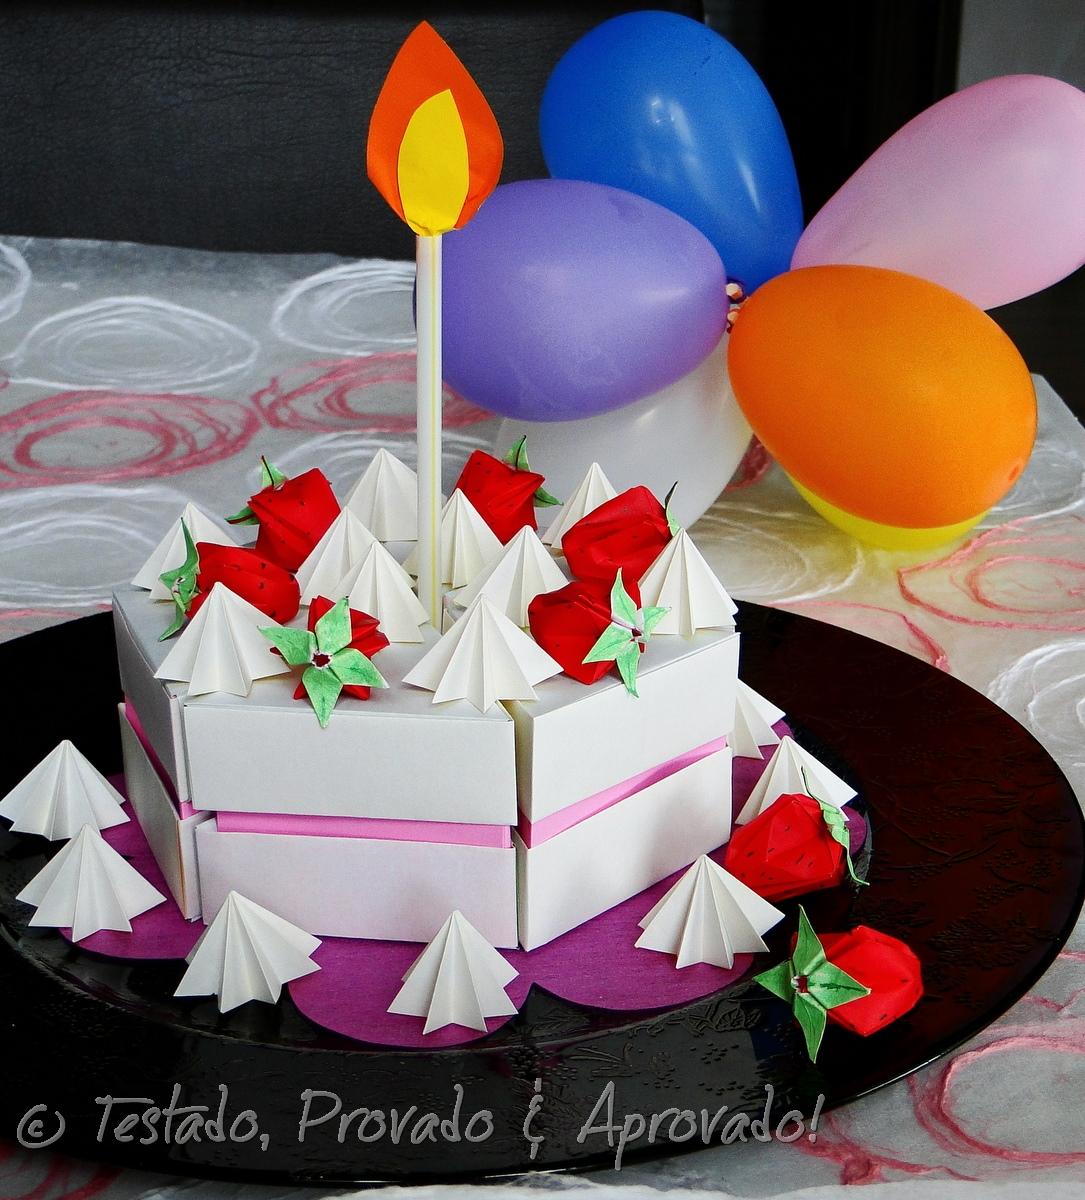 Testado, Provado e Aprovado!: HAPPY BIRTHDAY RAQUEL! - photo#49